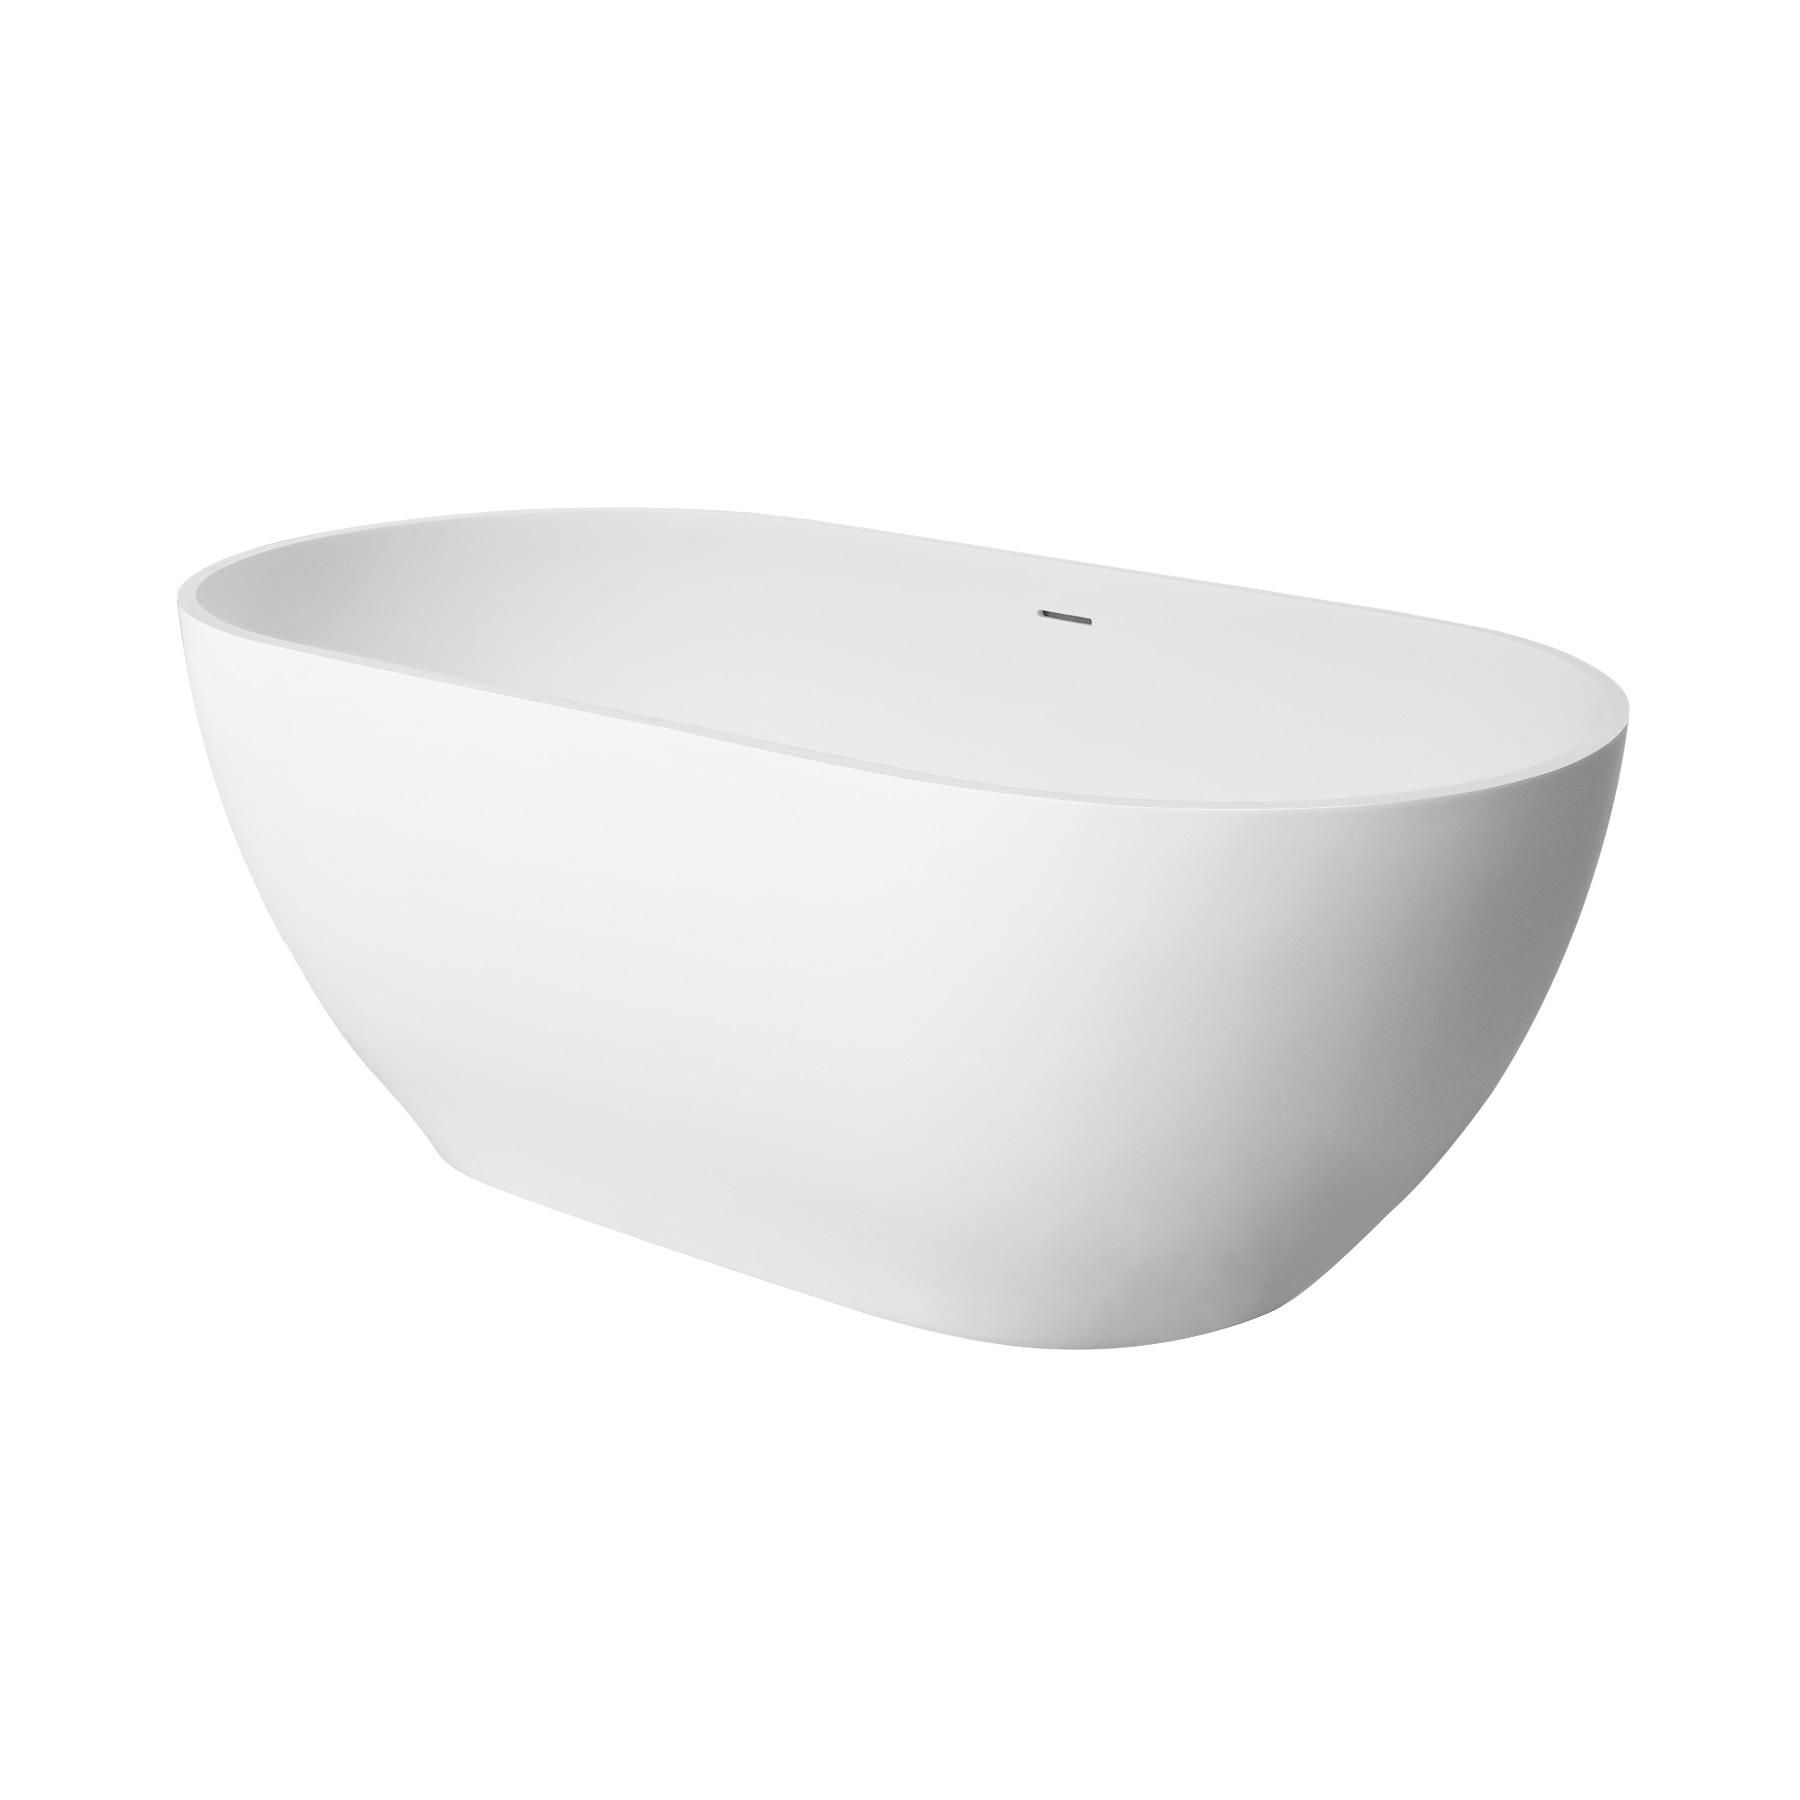 Shop Maykke 60-Inch Faro Solid Surface Freestanding Tub, Matte White ...